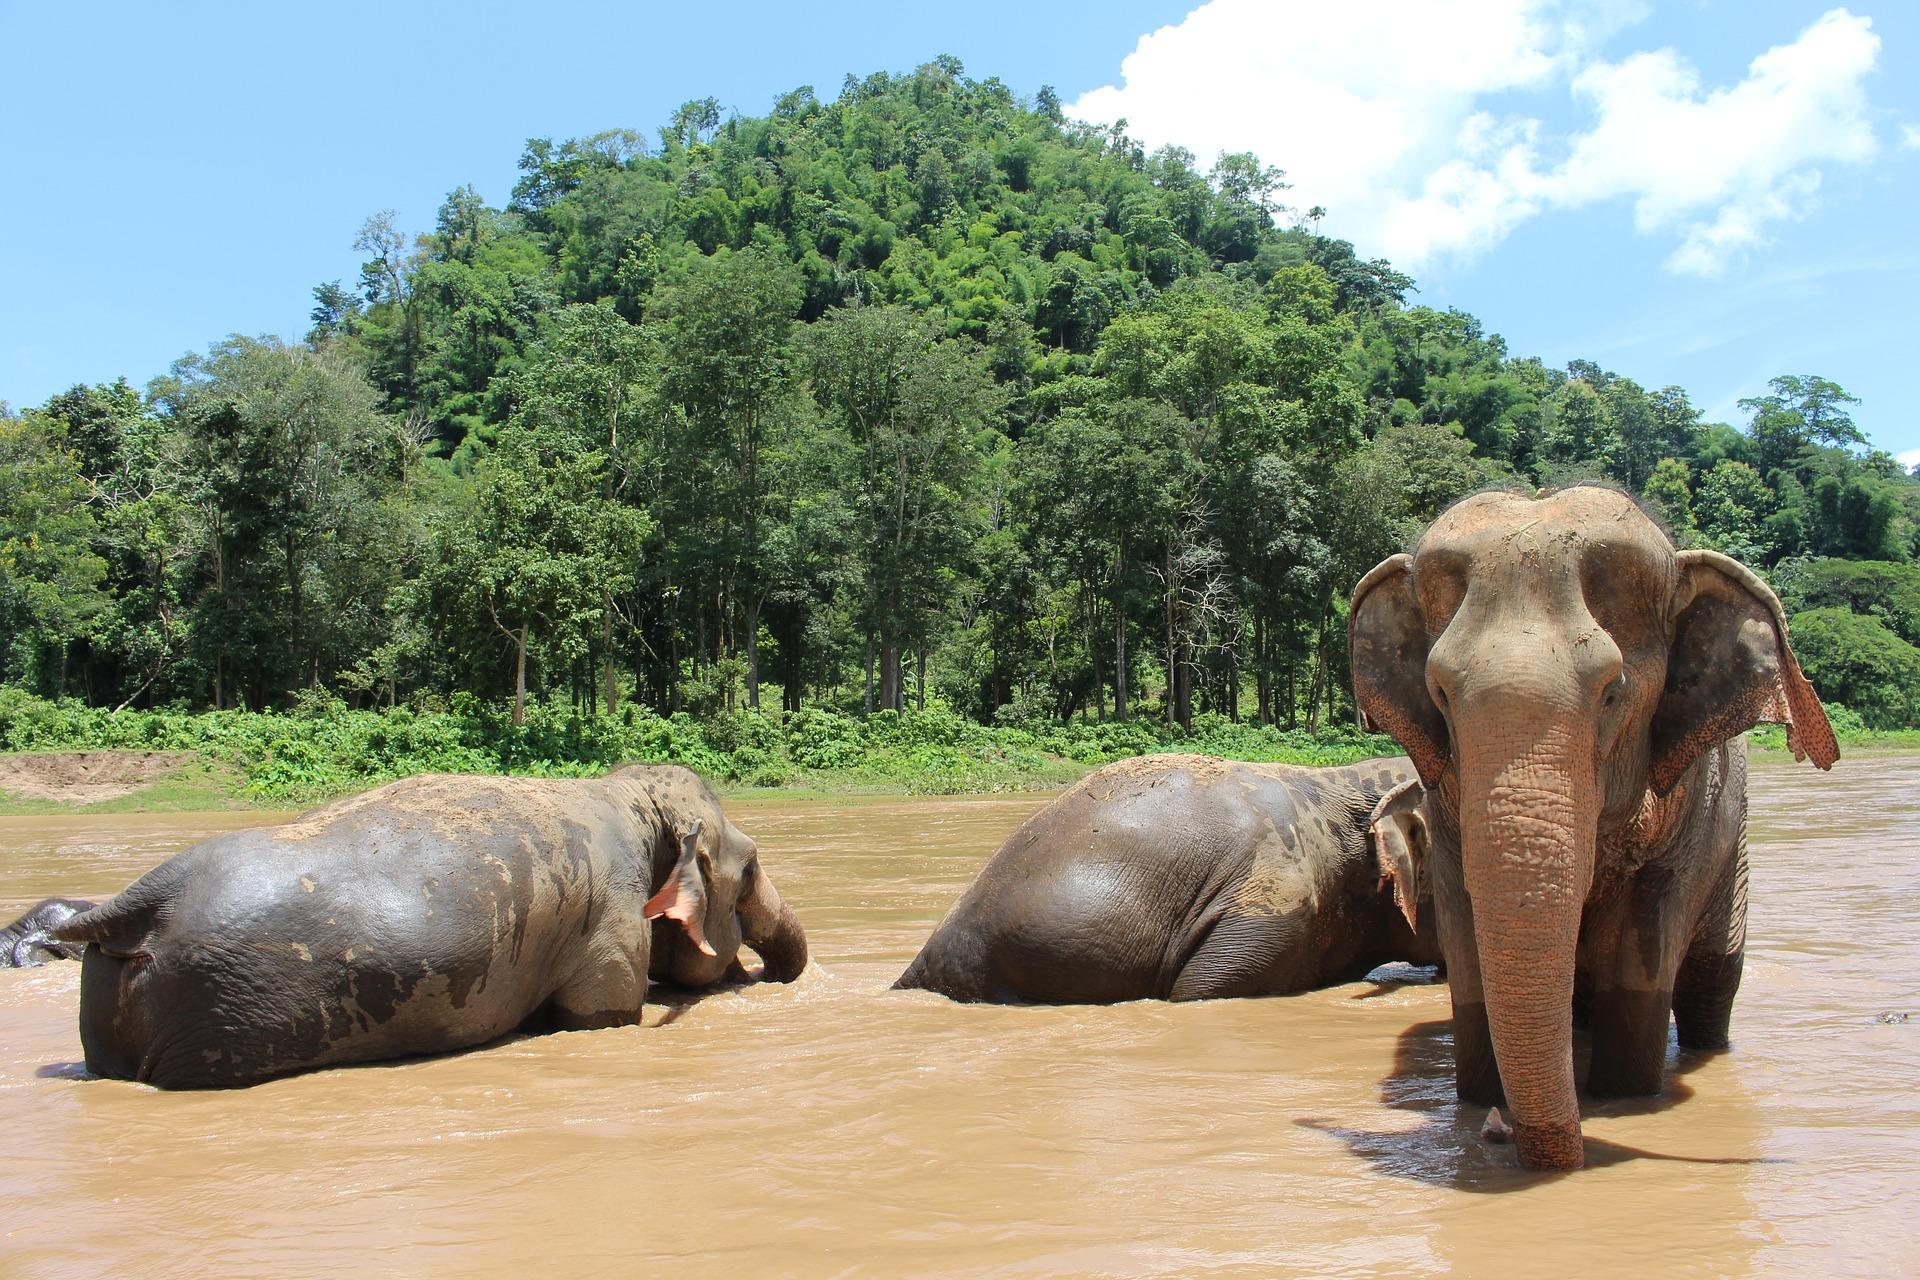 elephant-2647010_1920.jpg